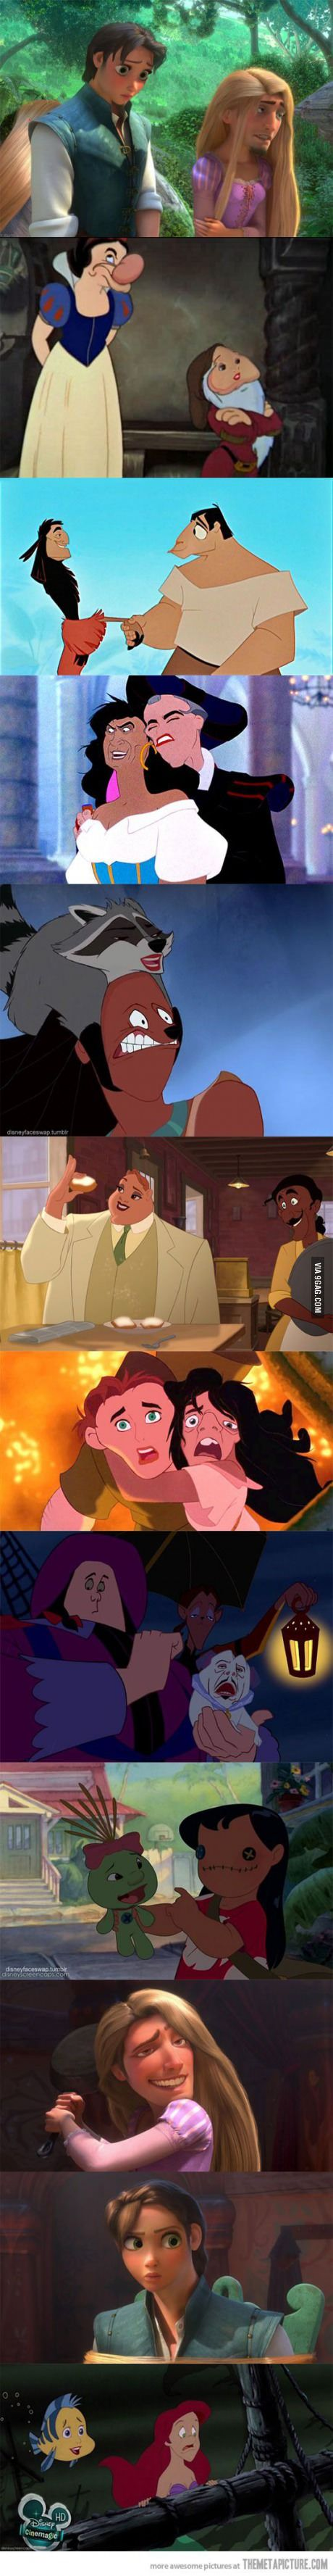 Disney faceswaps....